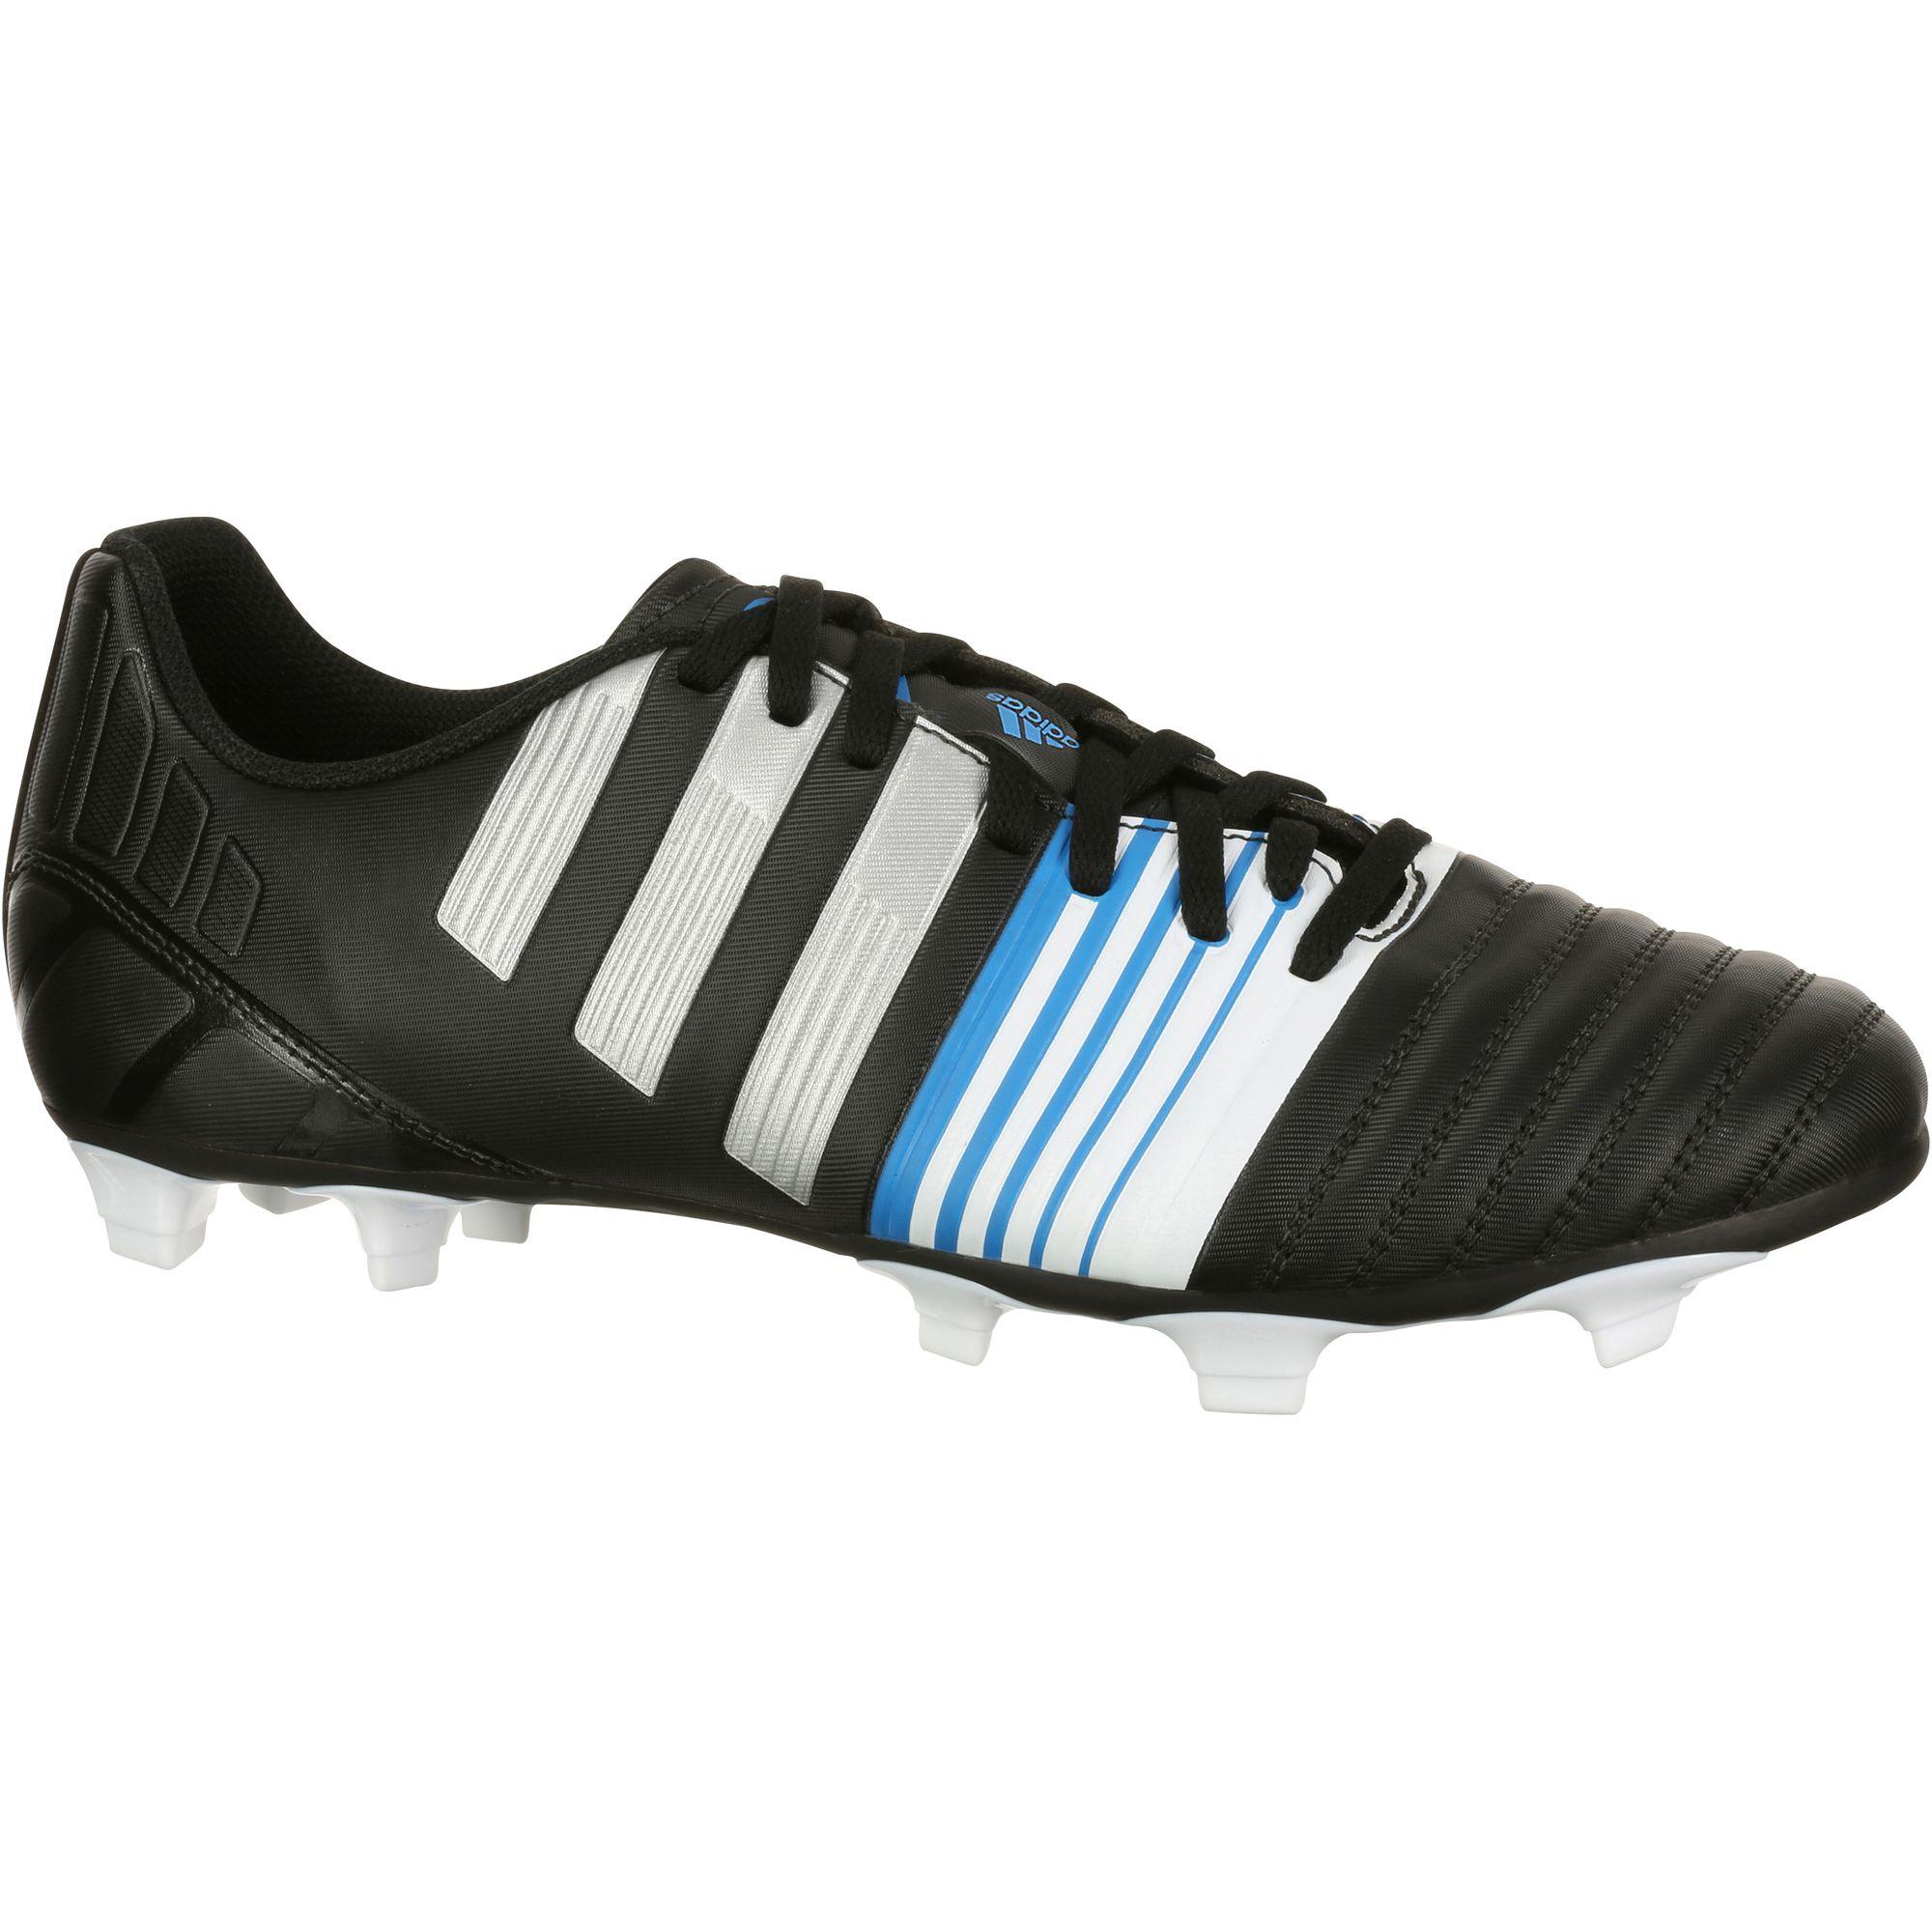 Chaussure de football Nitrocharge 4.0 FG adulte